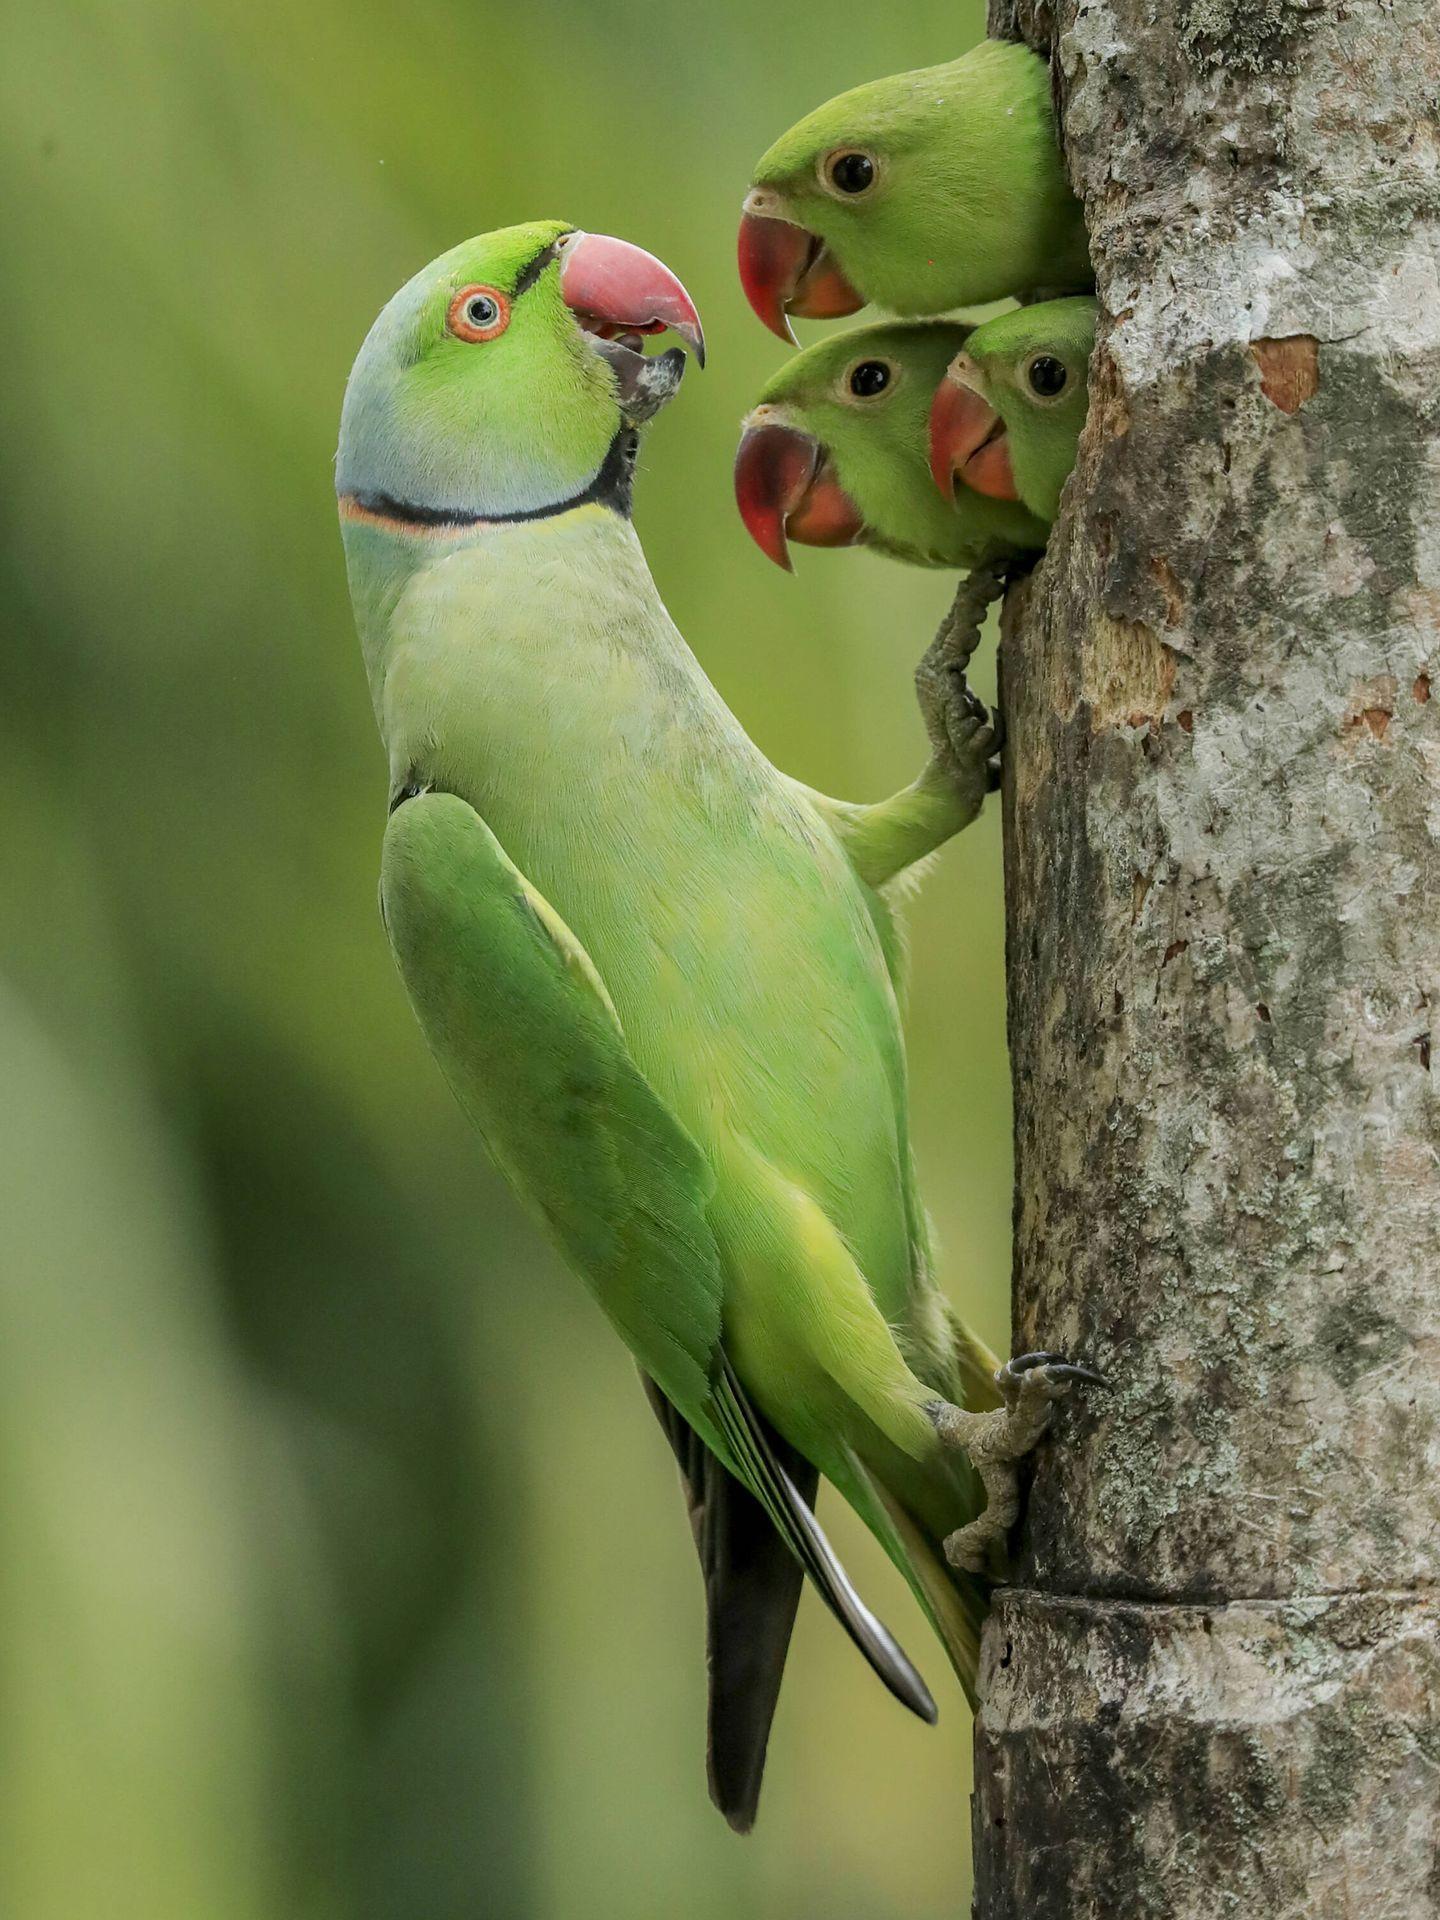 Una cotorra de Kramer alimenta a sus crías Gagana. (Mendis Wickramasinghe/Wildlife Photographer of the Year)